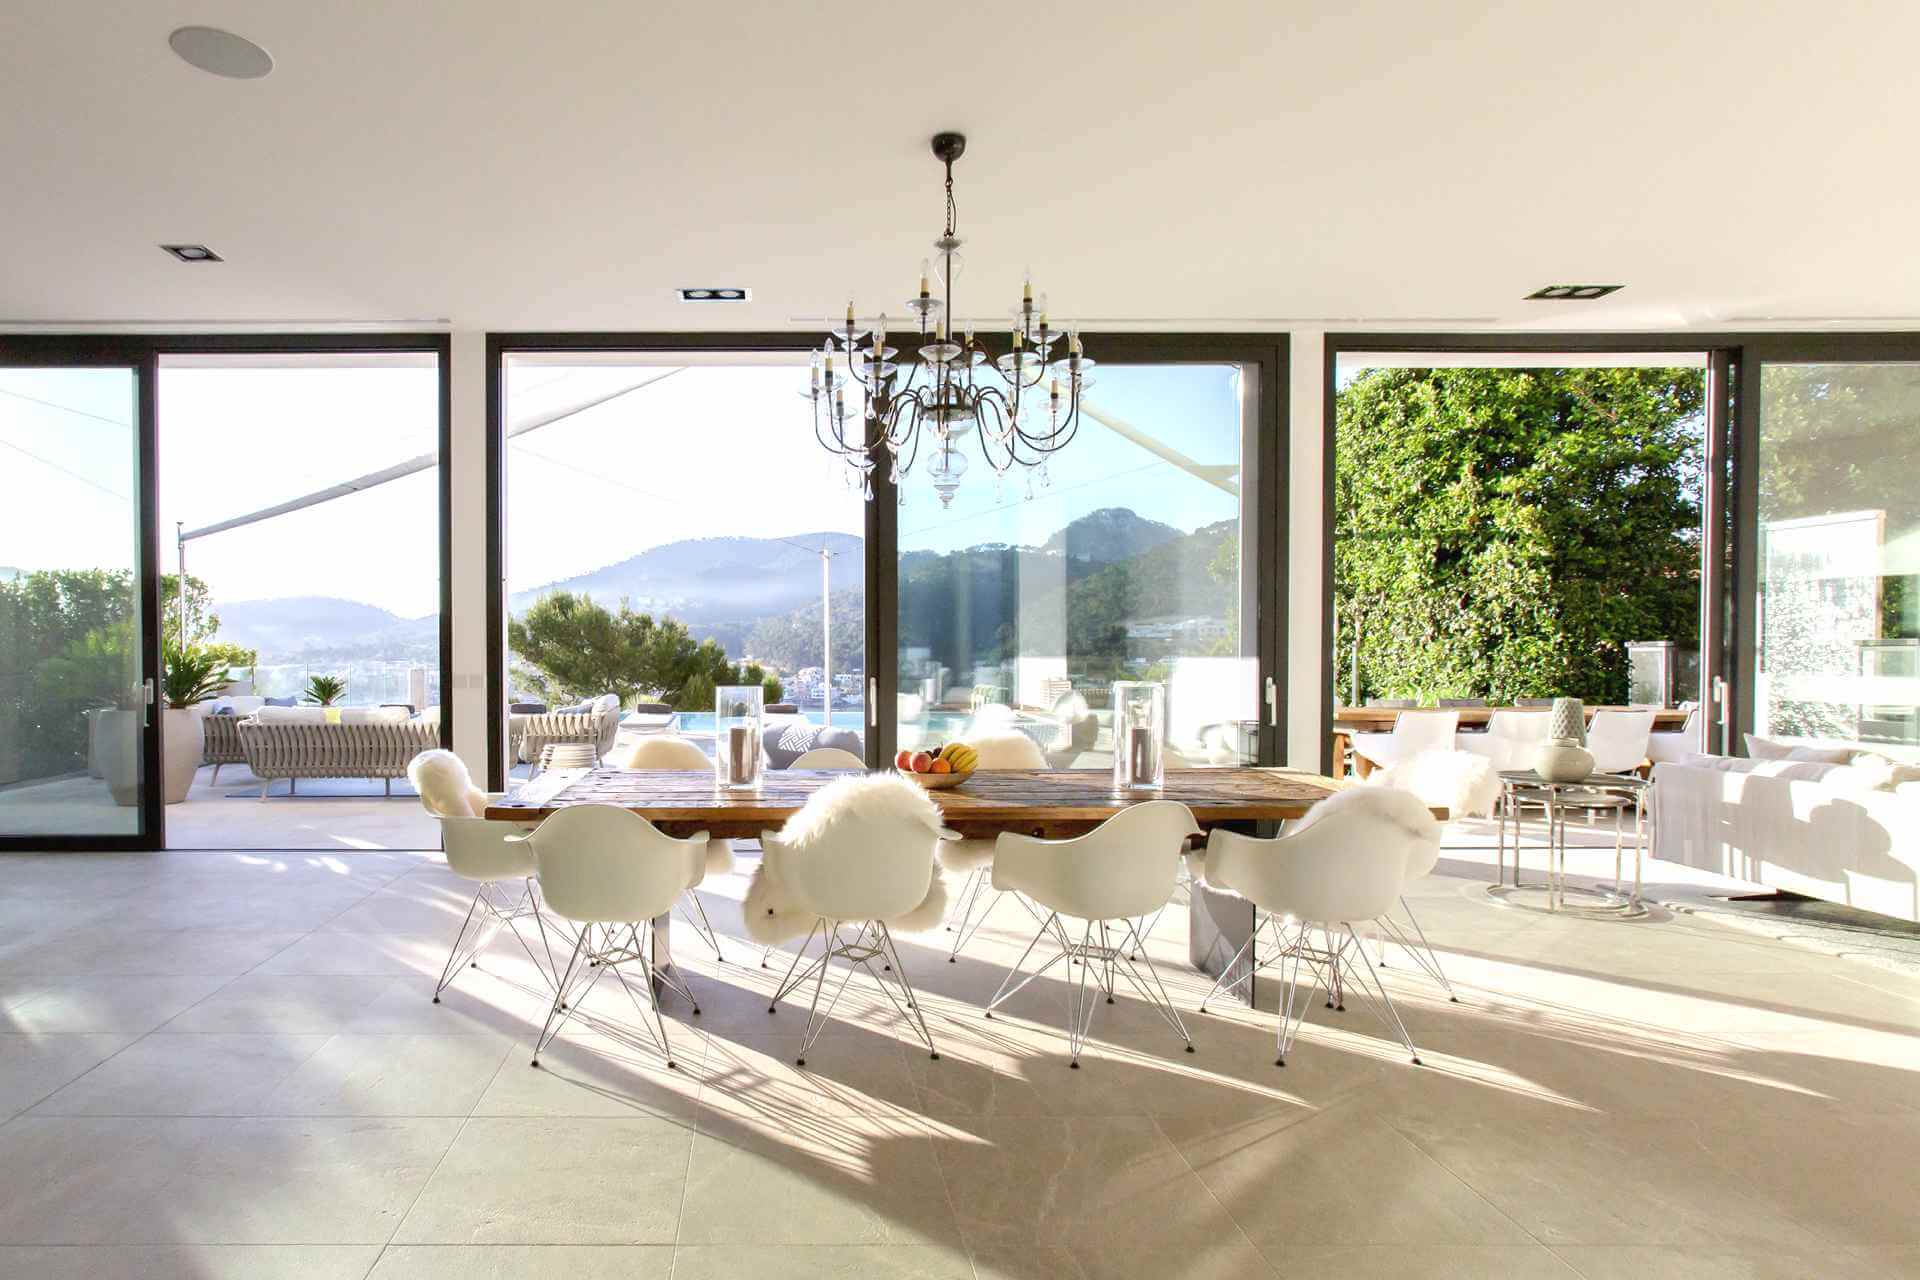 01-353 Villa with indoor pool Mallorca Southwest Bild 11